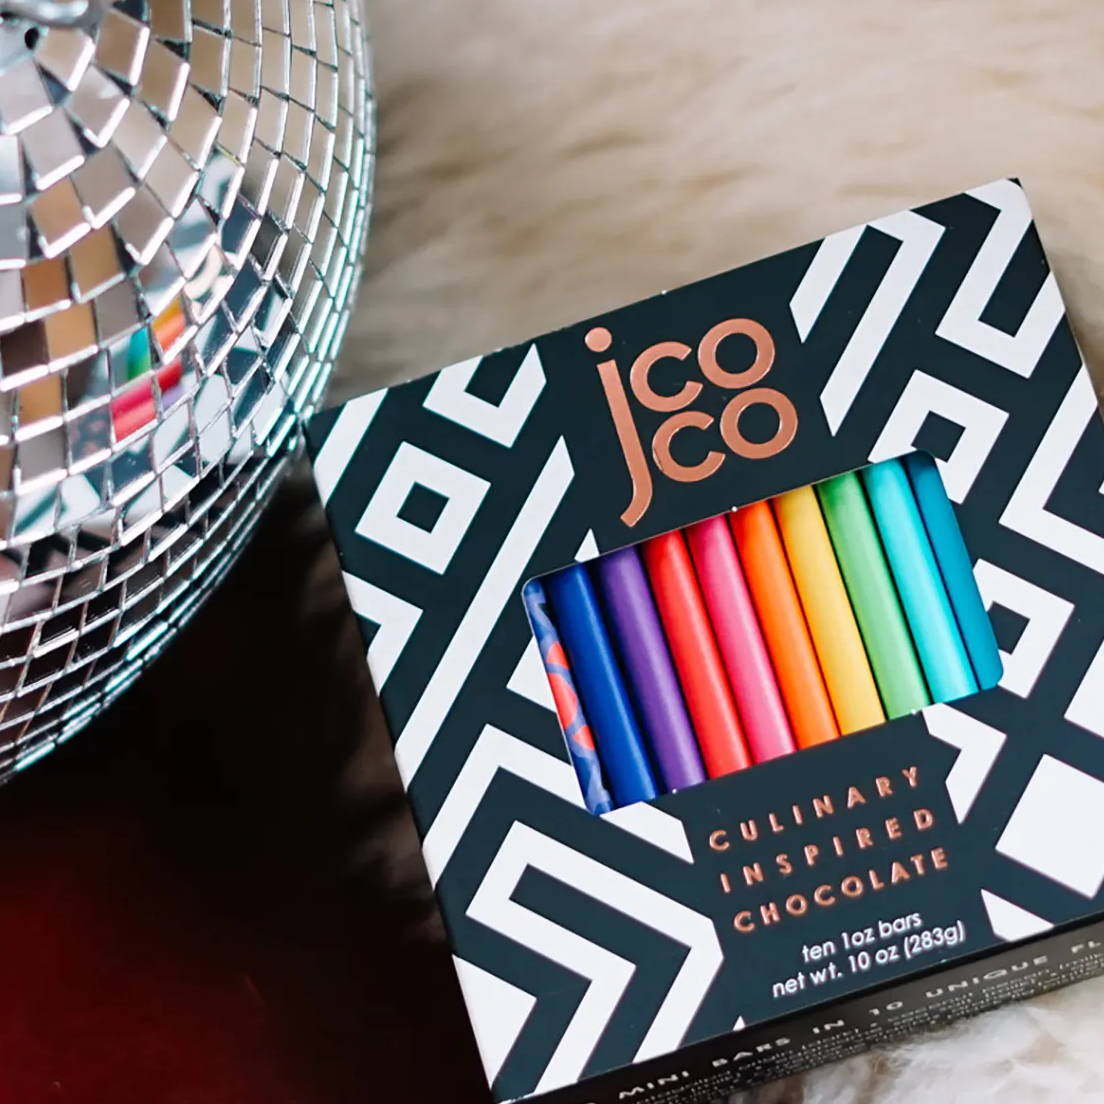 jcoco prism gift box